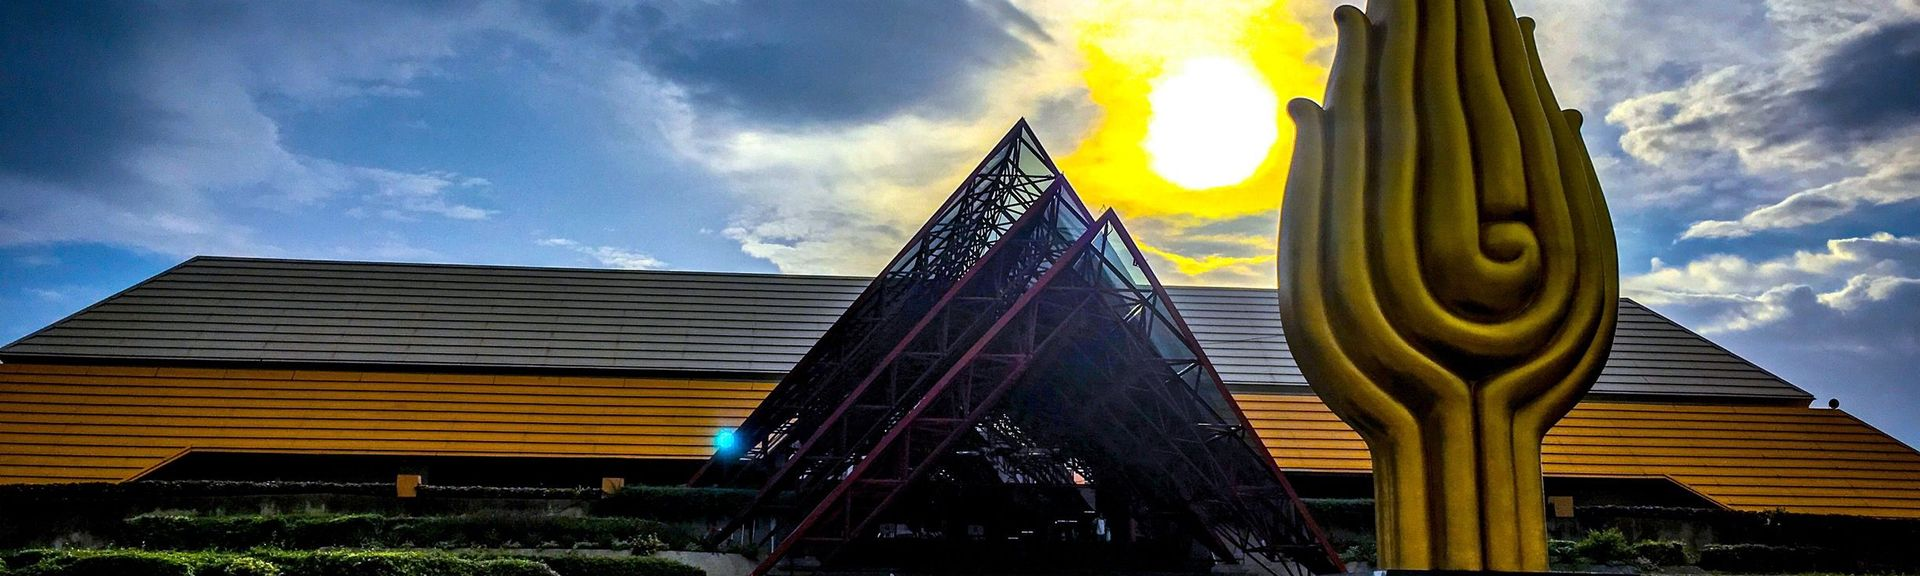 Queen Sirikit National Convention Center, Bangkok, Thailand